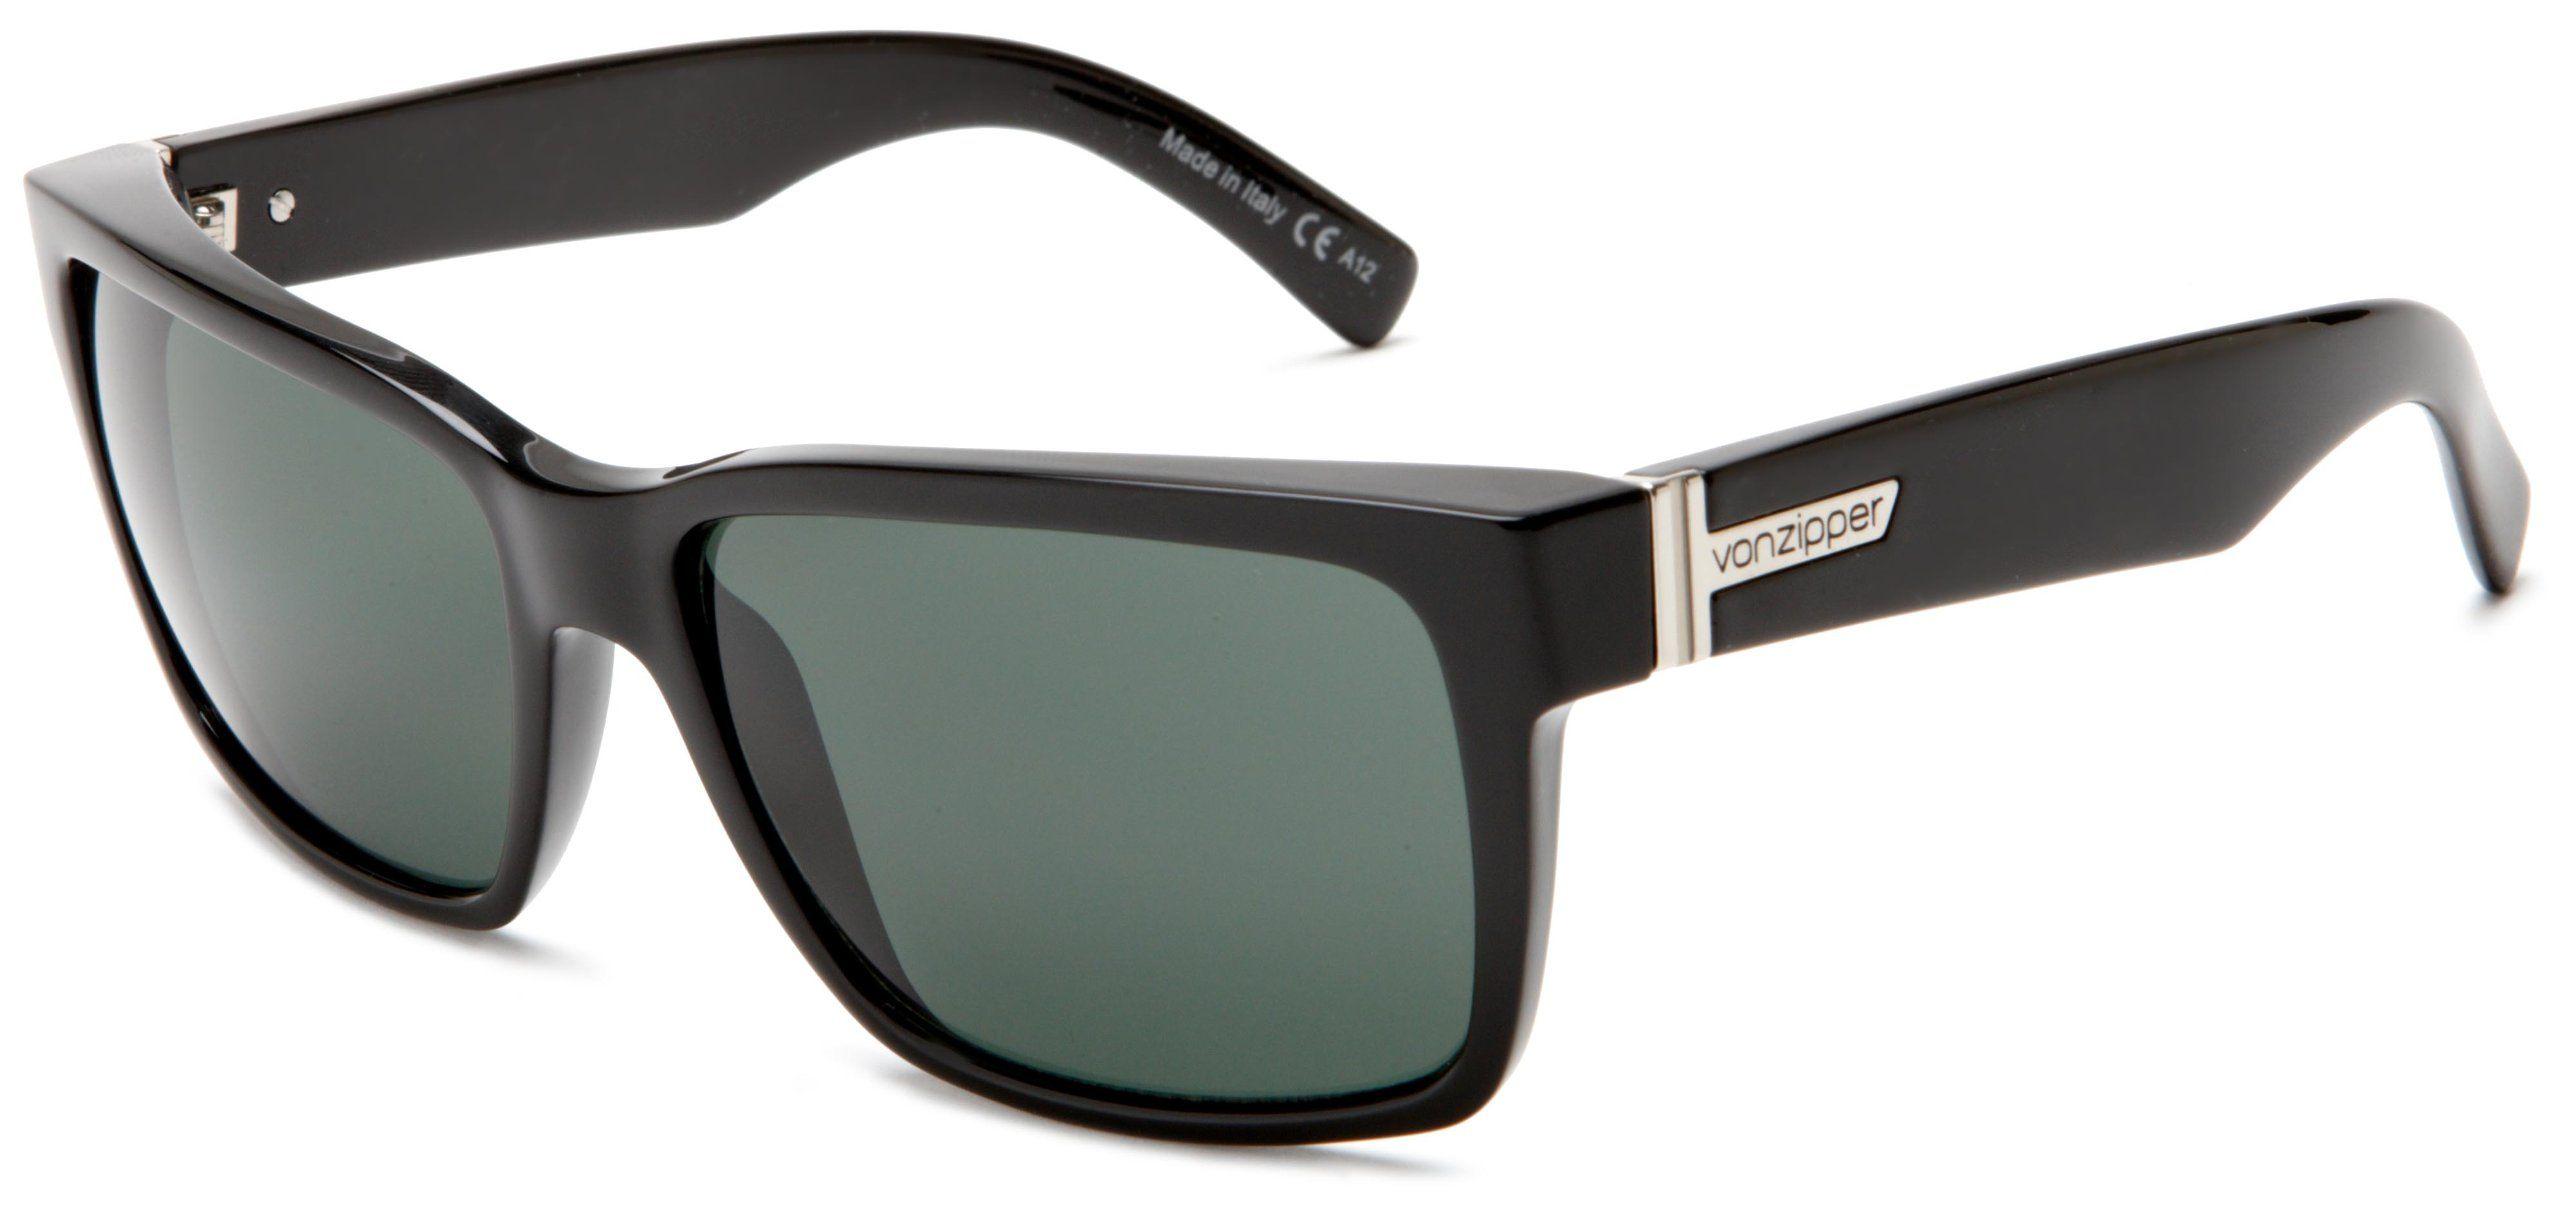 195c6957a1 VonZipper Elmore Men s Casual Sunglasses - Black Gloss Vintage Grey ...